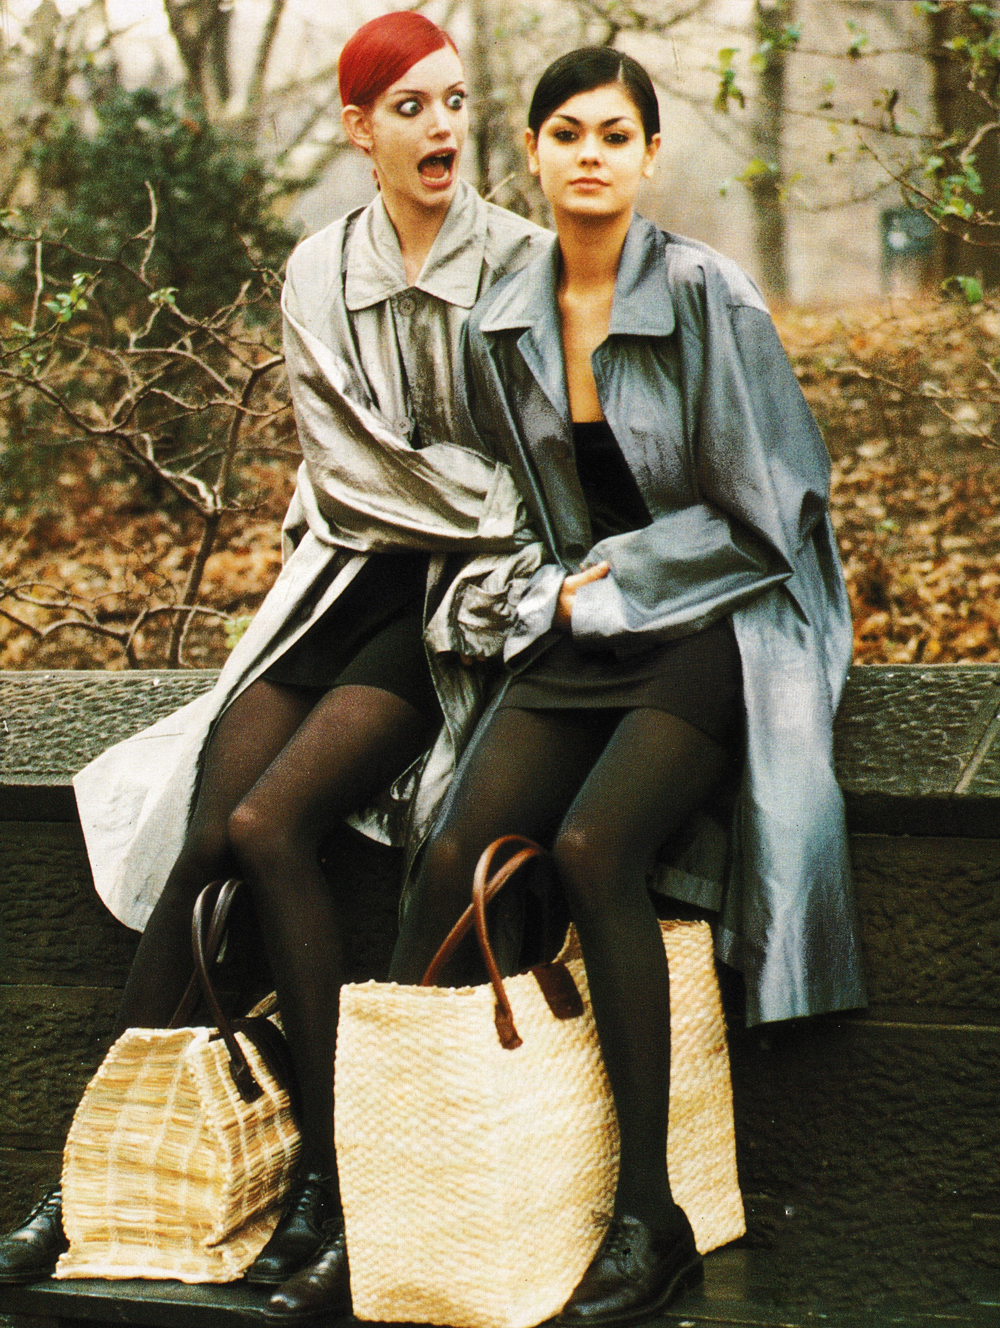 Vogue Italia January 1994 via www.fashionedbylove.co.uk